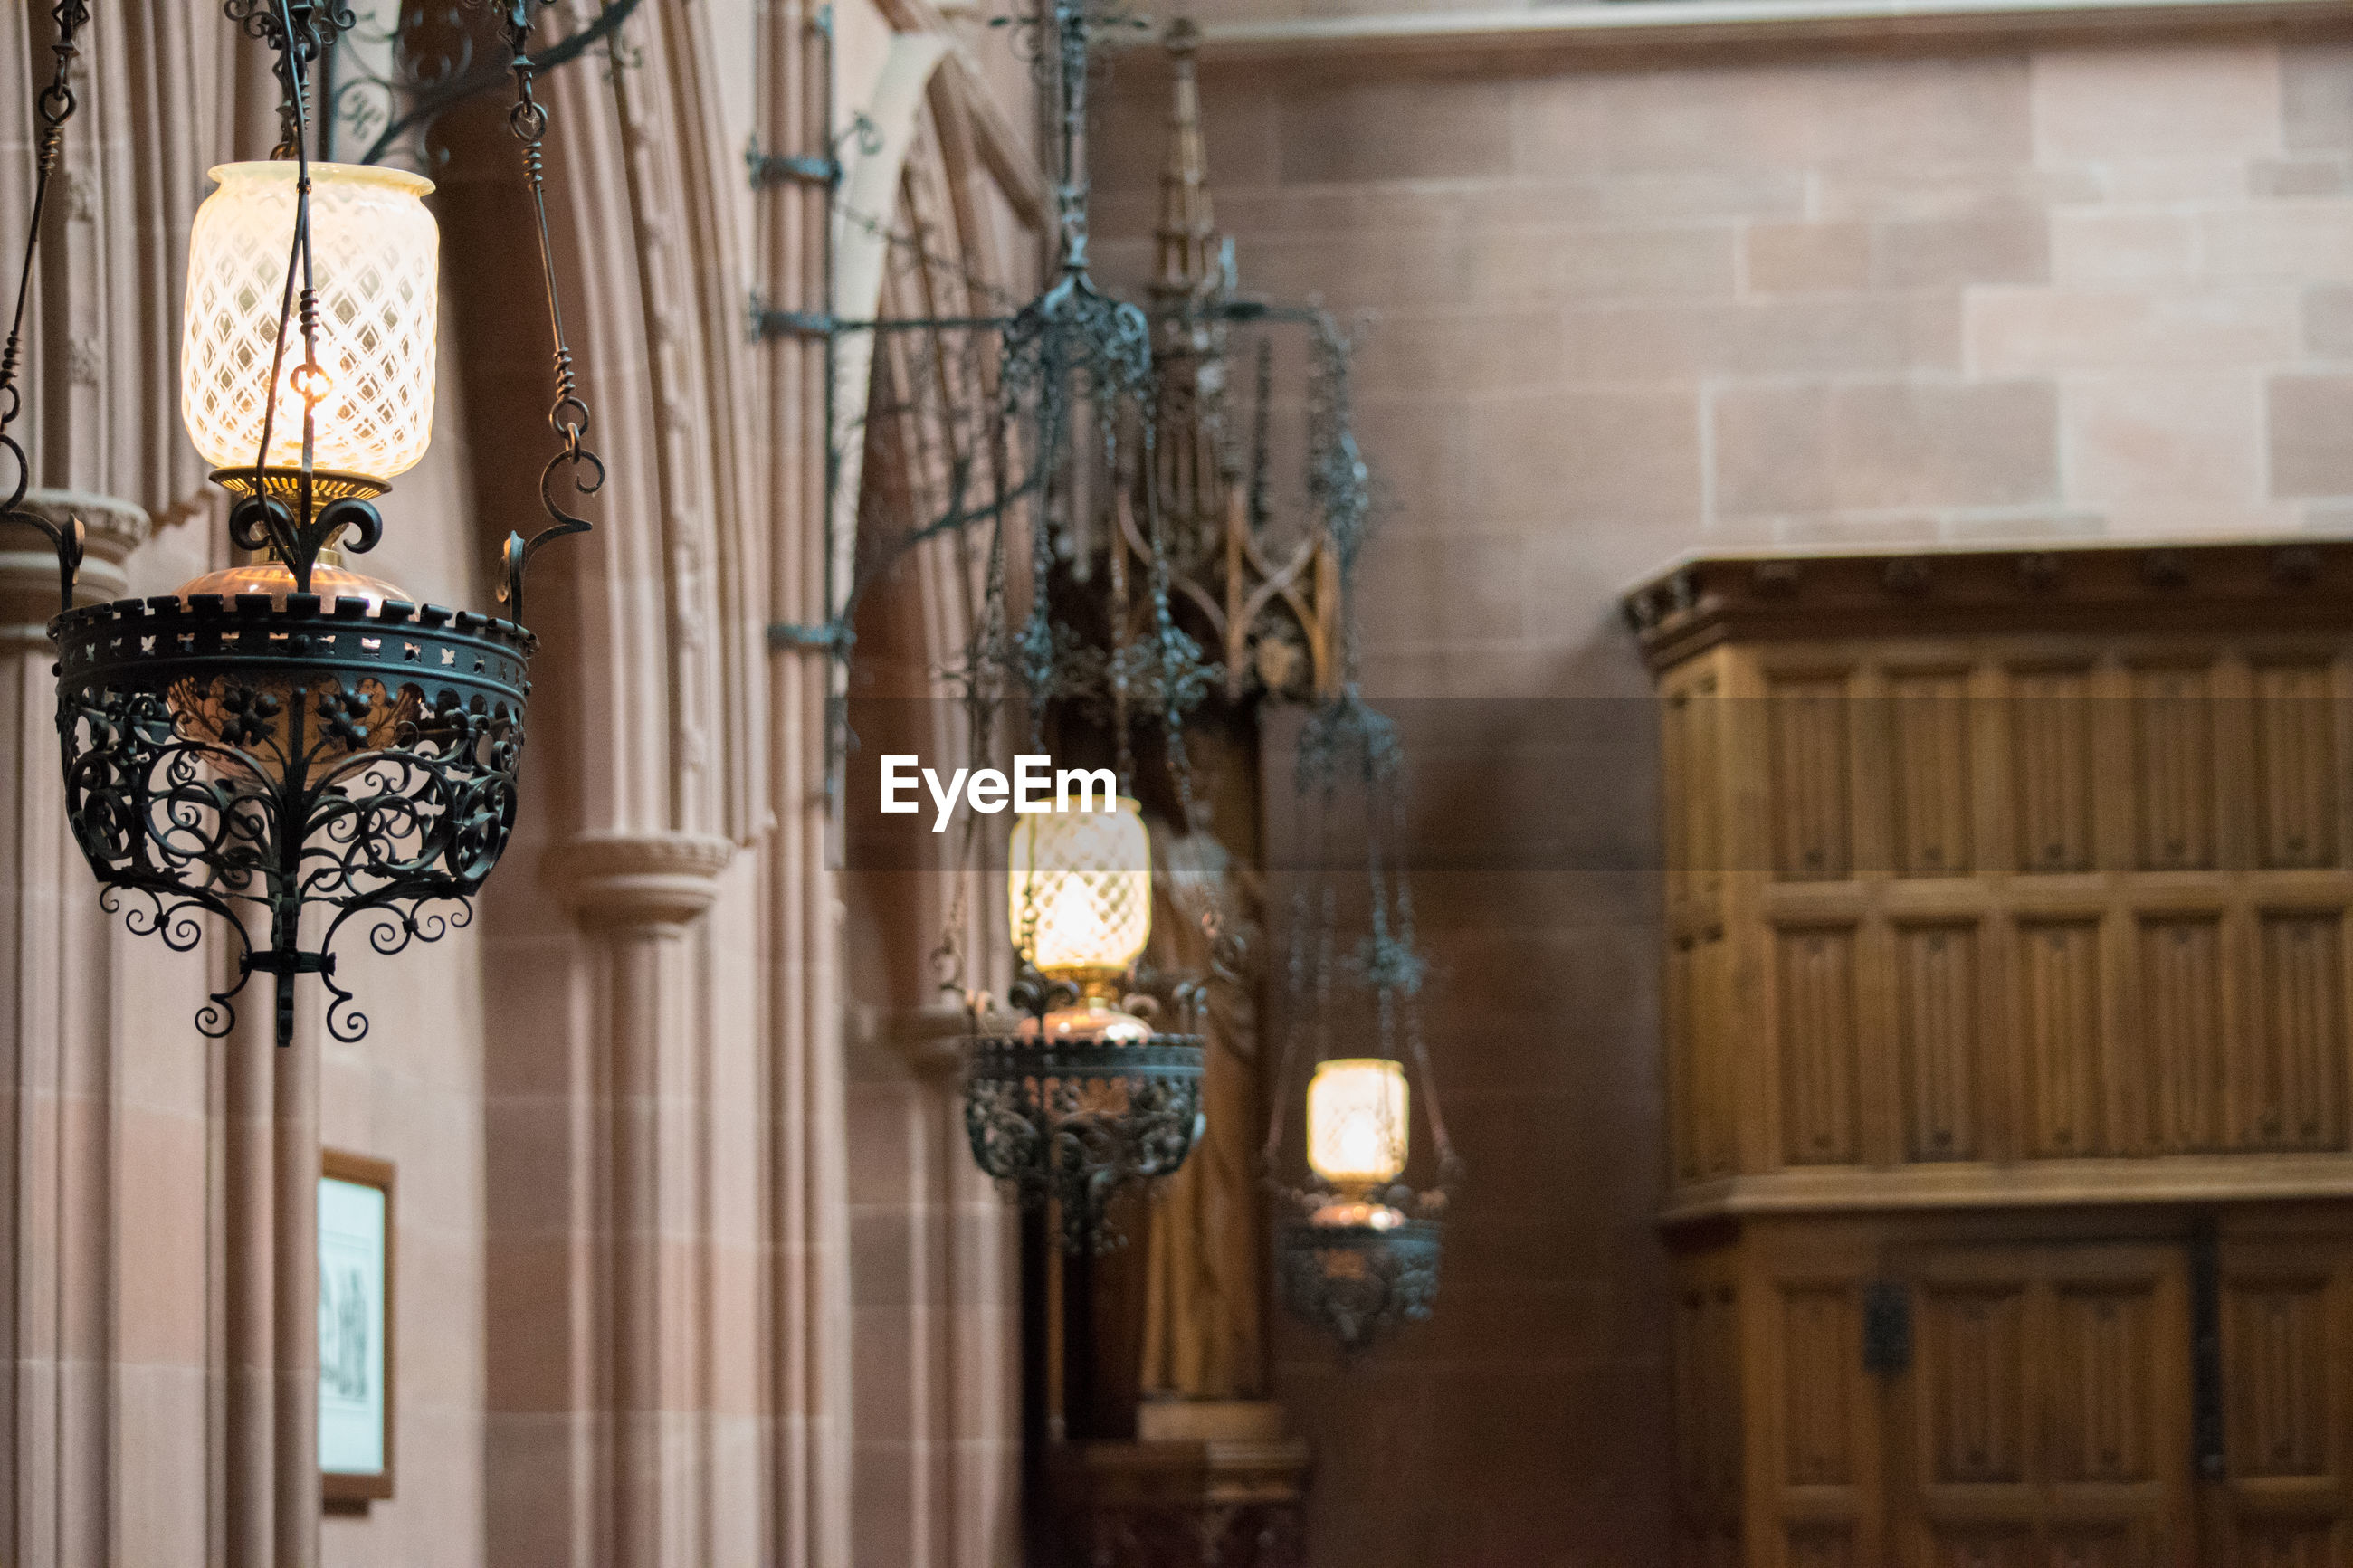 Lanterns hanging in historic building